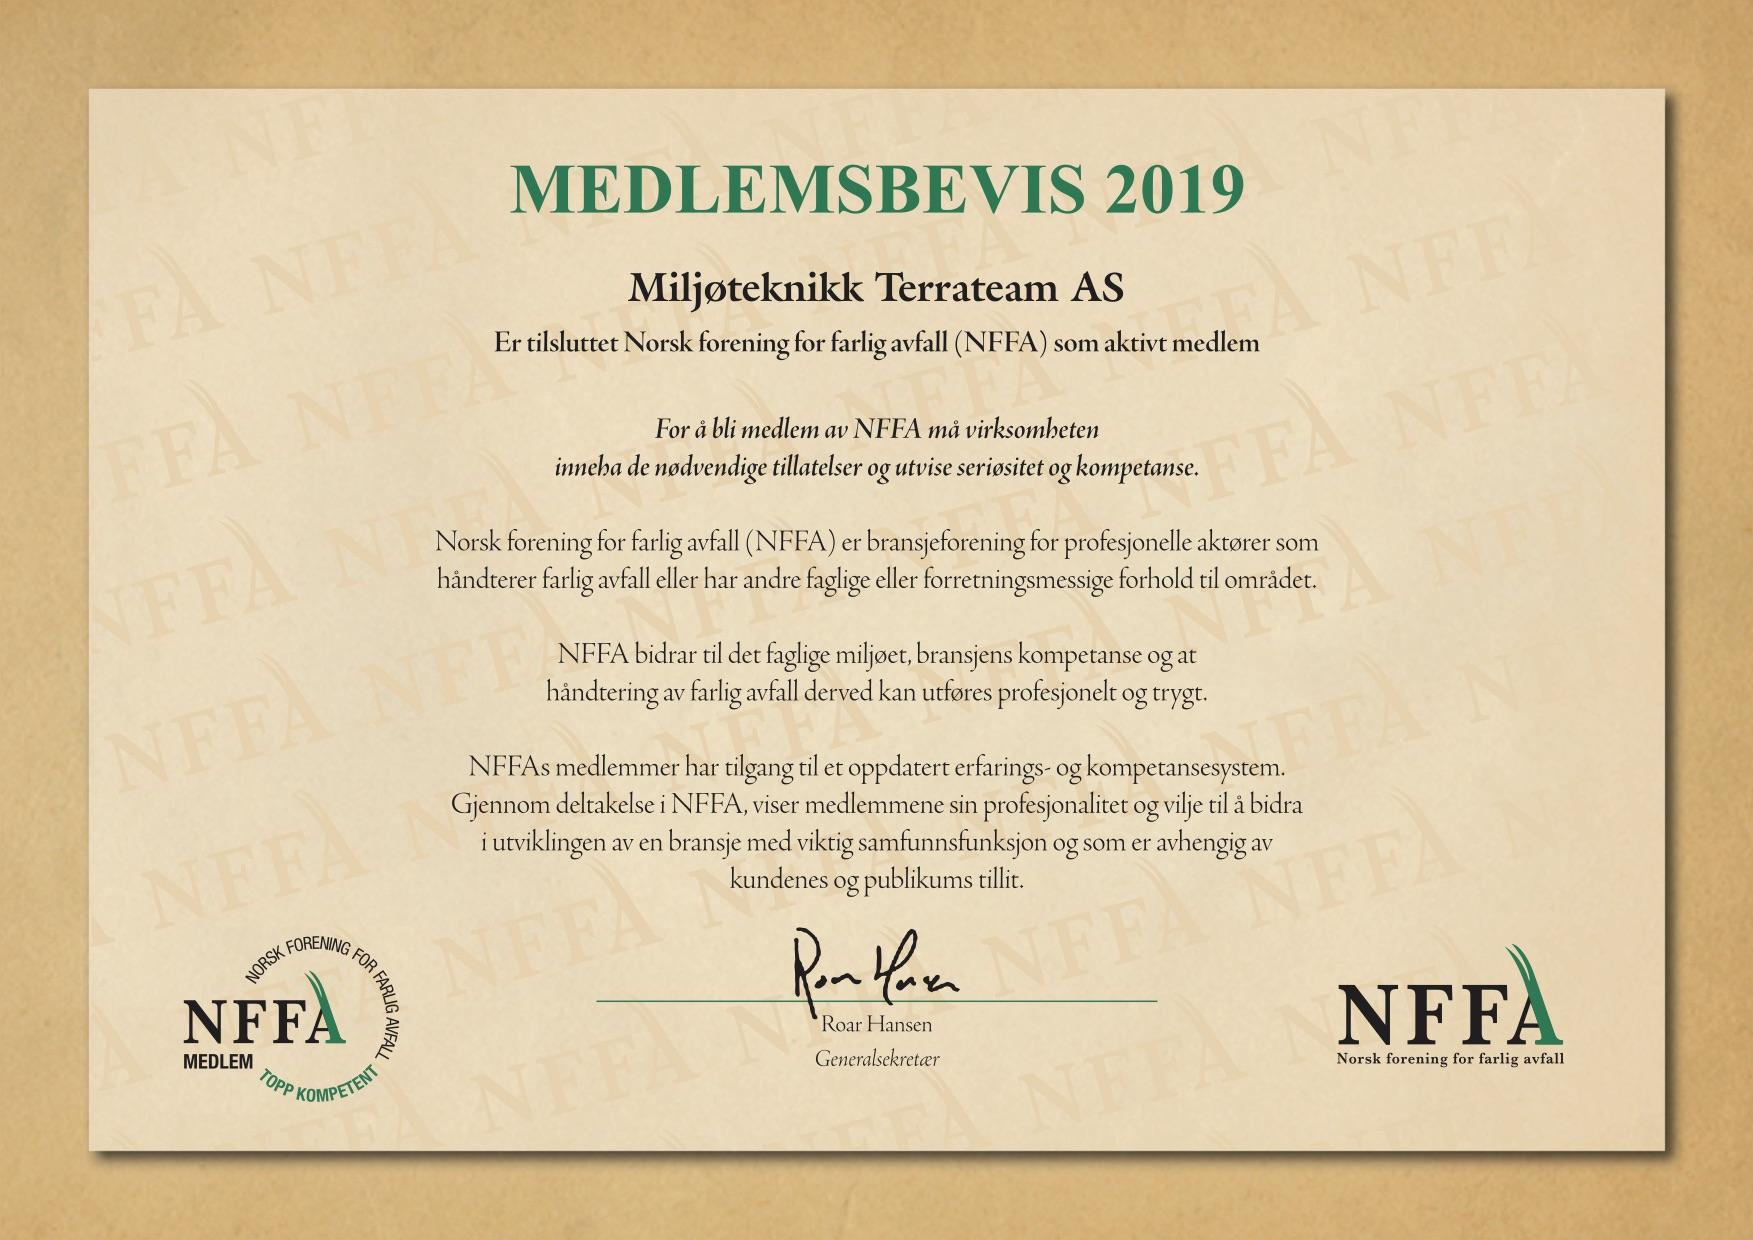 NFFA medlemsbevis 2019